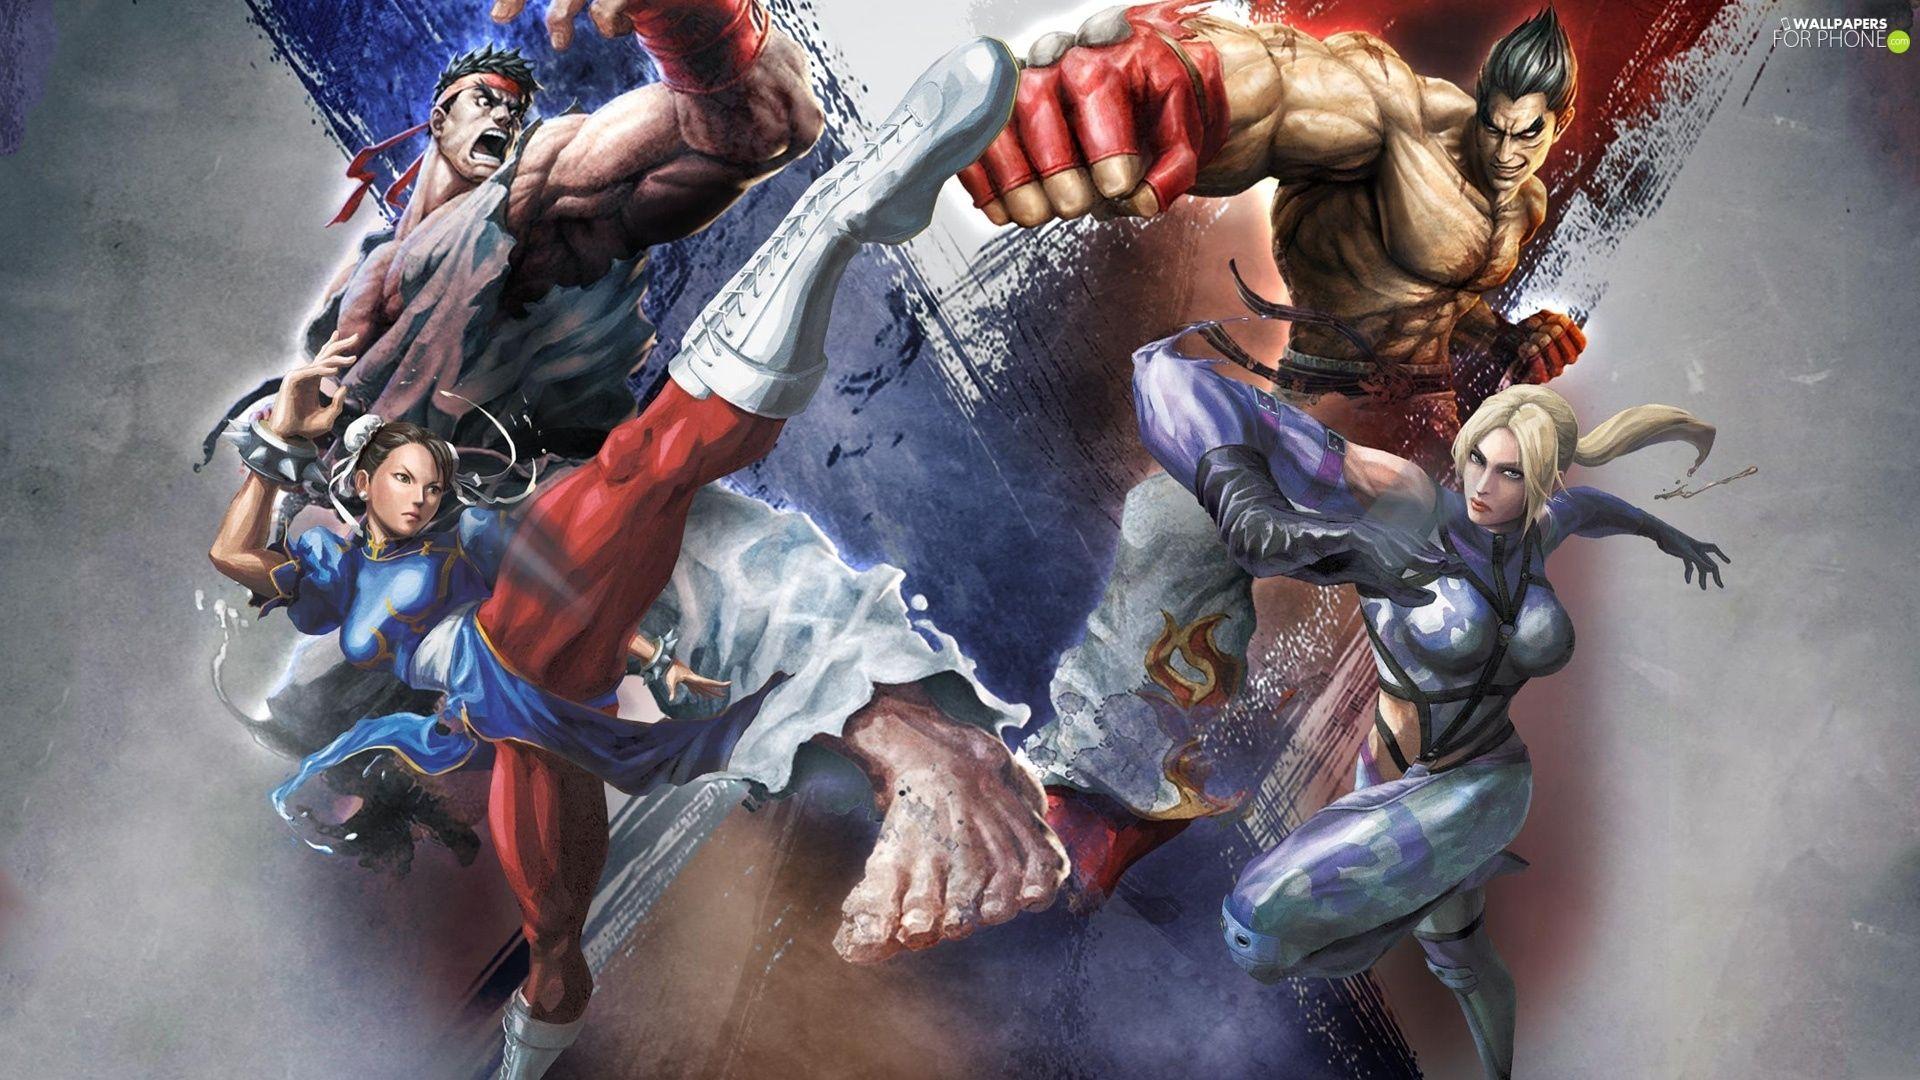 Nina Williams Kazuya Mishima Ryu Chun Li Street Fighter